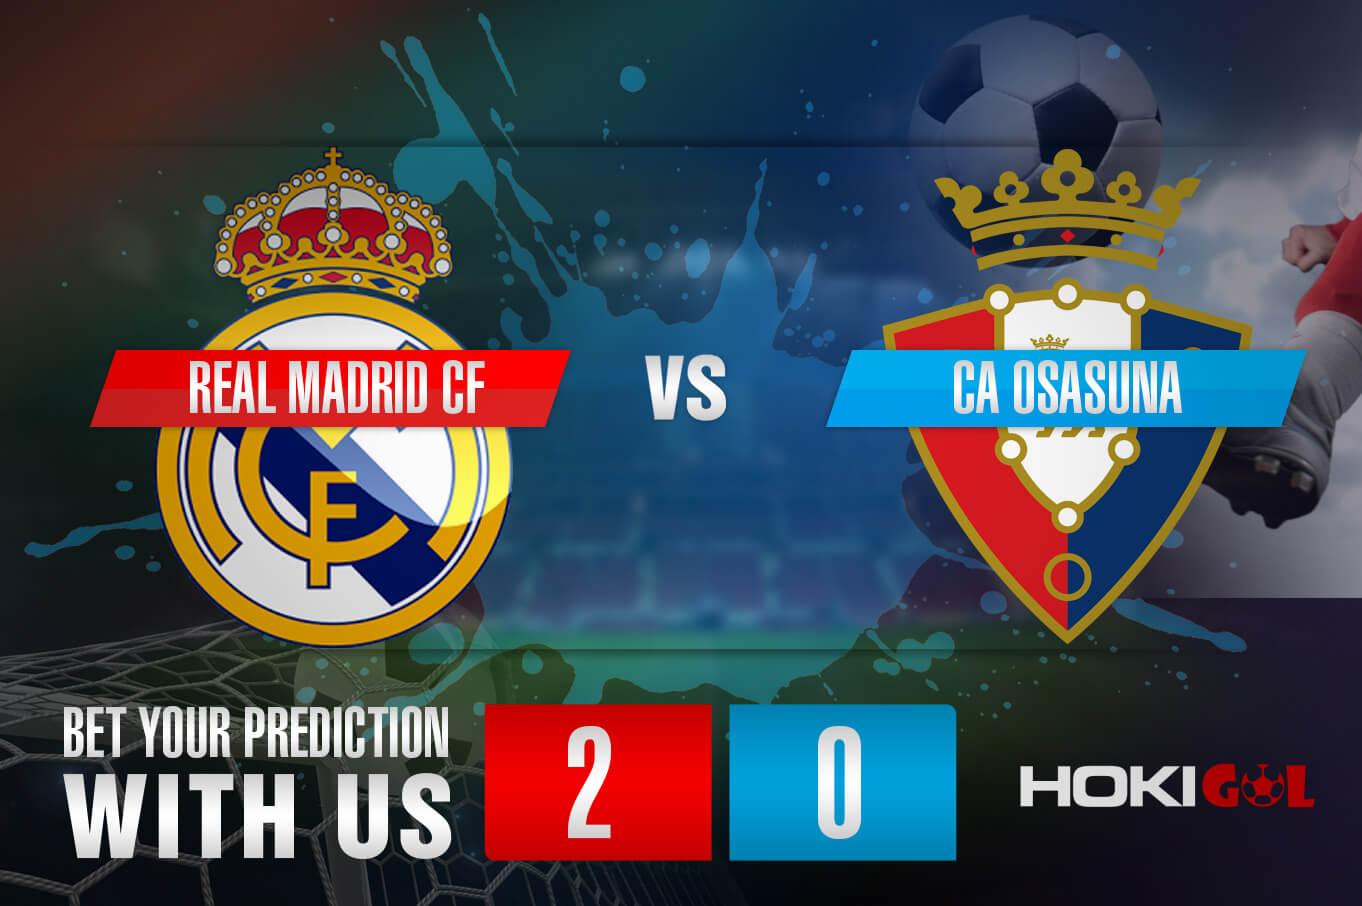 Prediksi Bola Real Madrid CF Vs CA Osasuna 2 Mei 2021